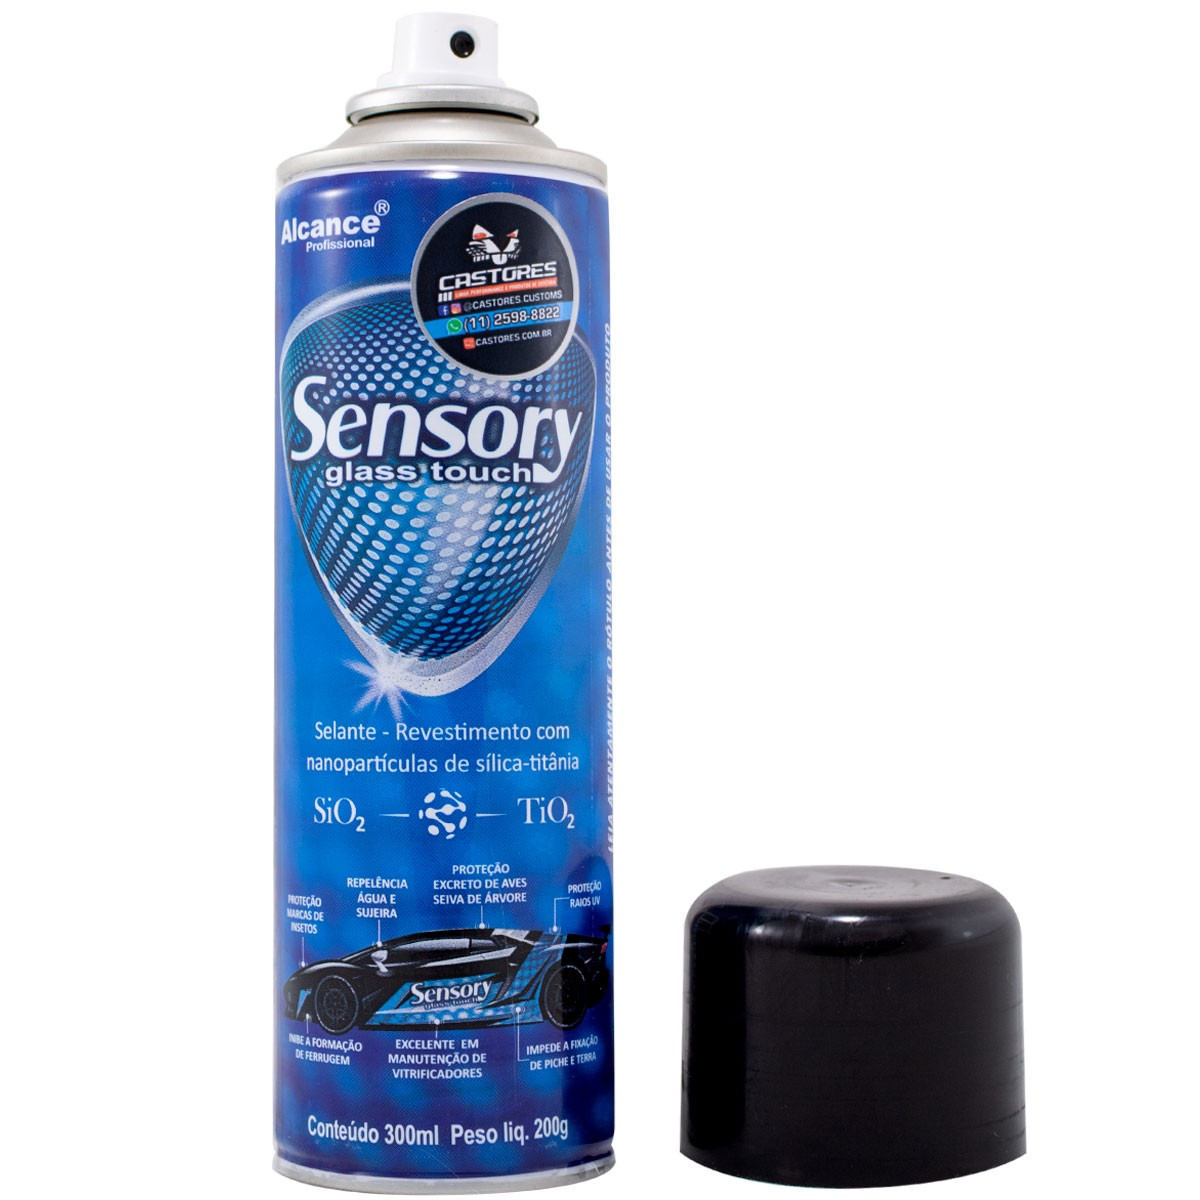 Selante De Pintura Sensory Spray Alcance Profissional - 300ml